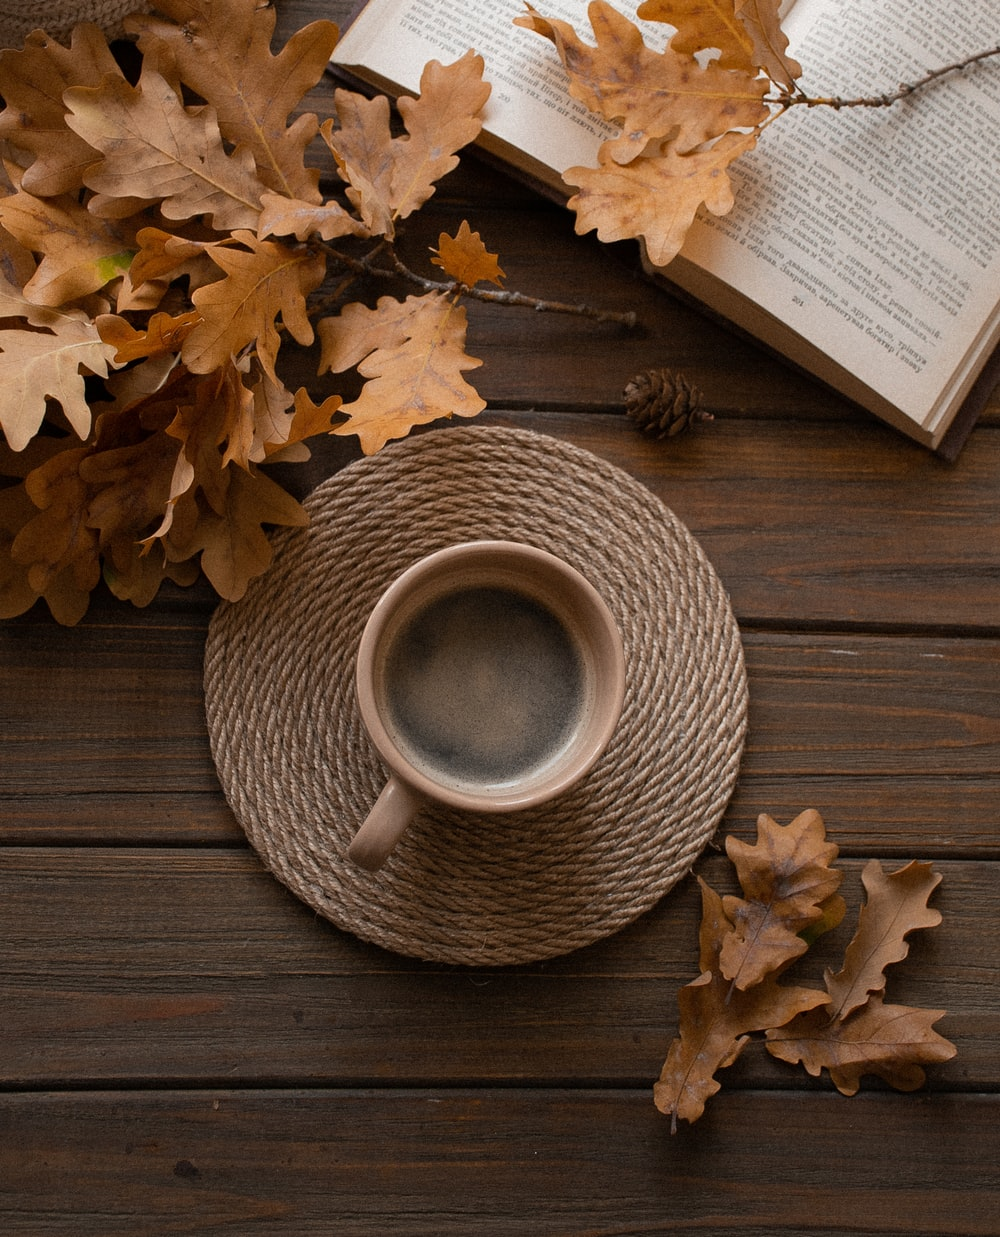 white ceramic mug on wicker saucer beside books with leaves